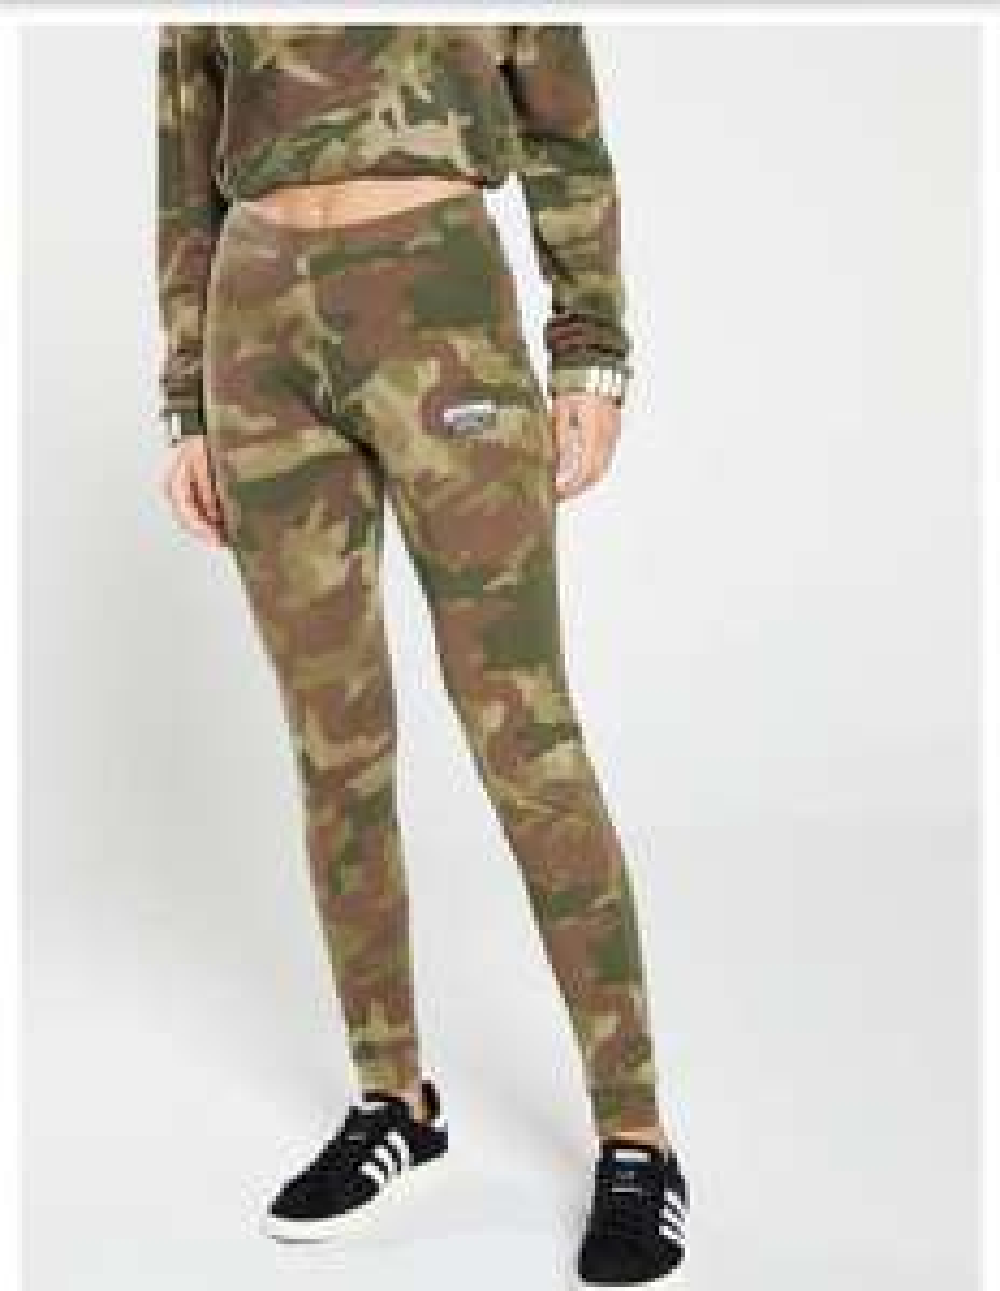 Adidas original camo leggings £16 @ Very - £2 click and collect